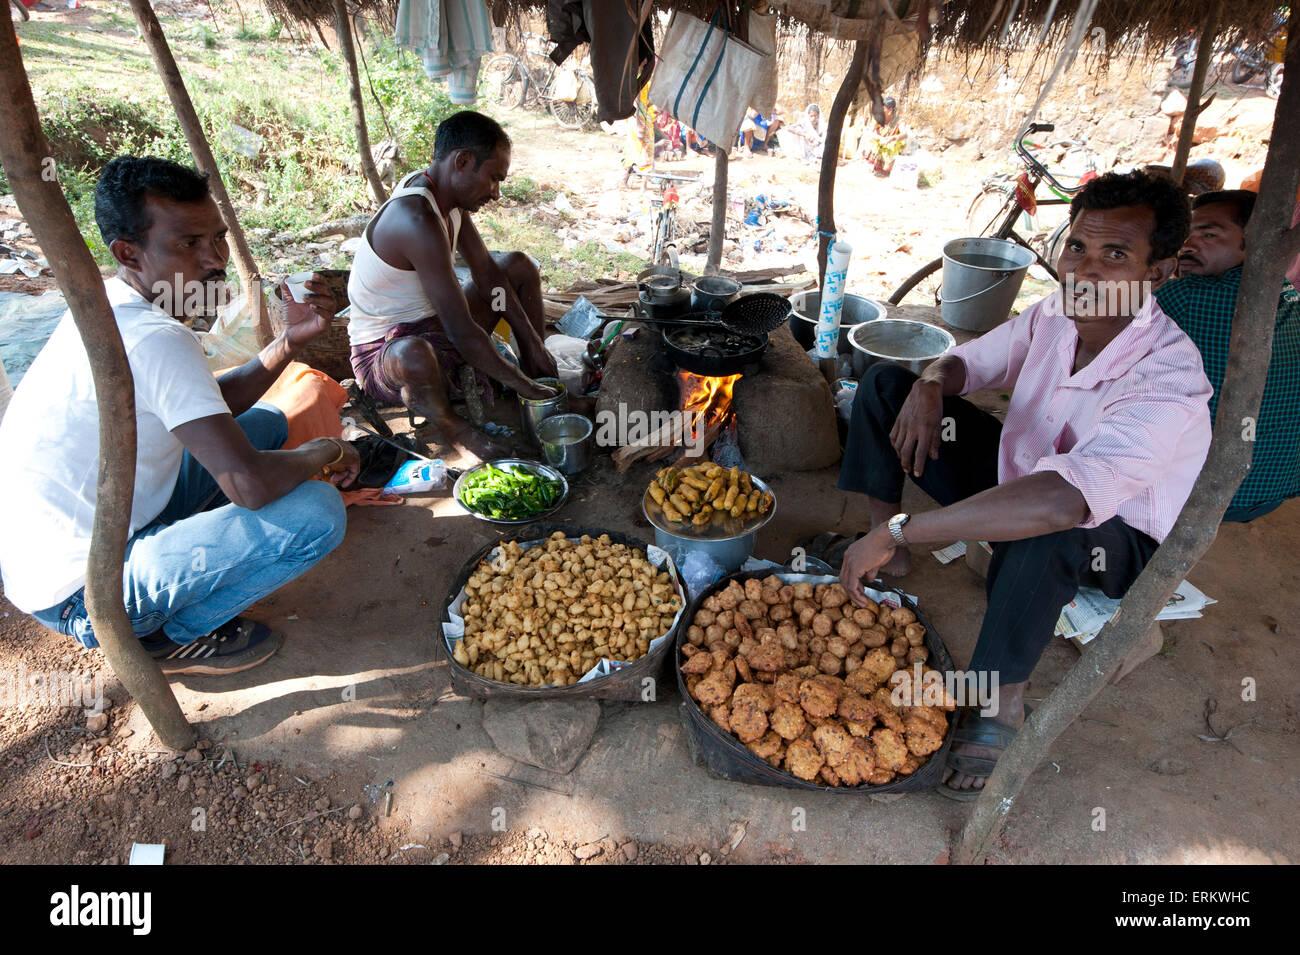 Bhaji and savoury snack stall in Mali weekly tribal market, Guneipada, Koraput district, Orissa (Odisha), India, Stock Photo